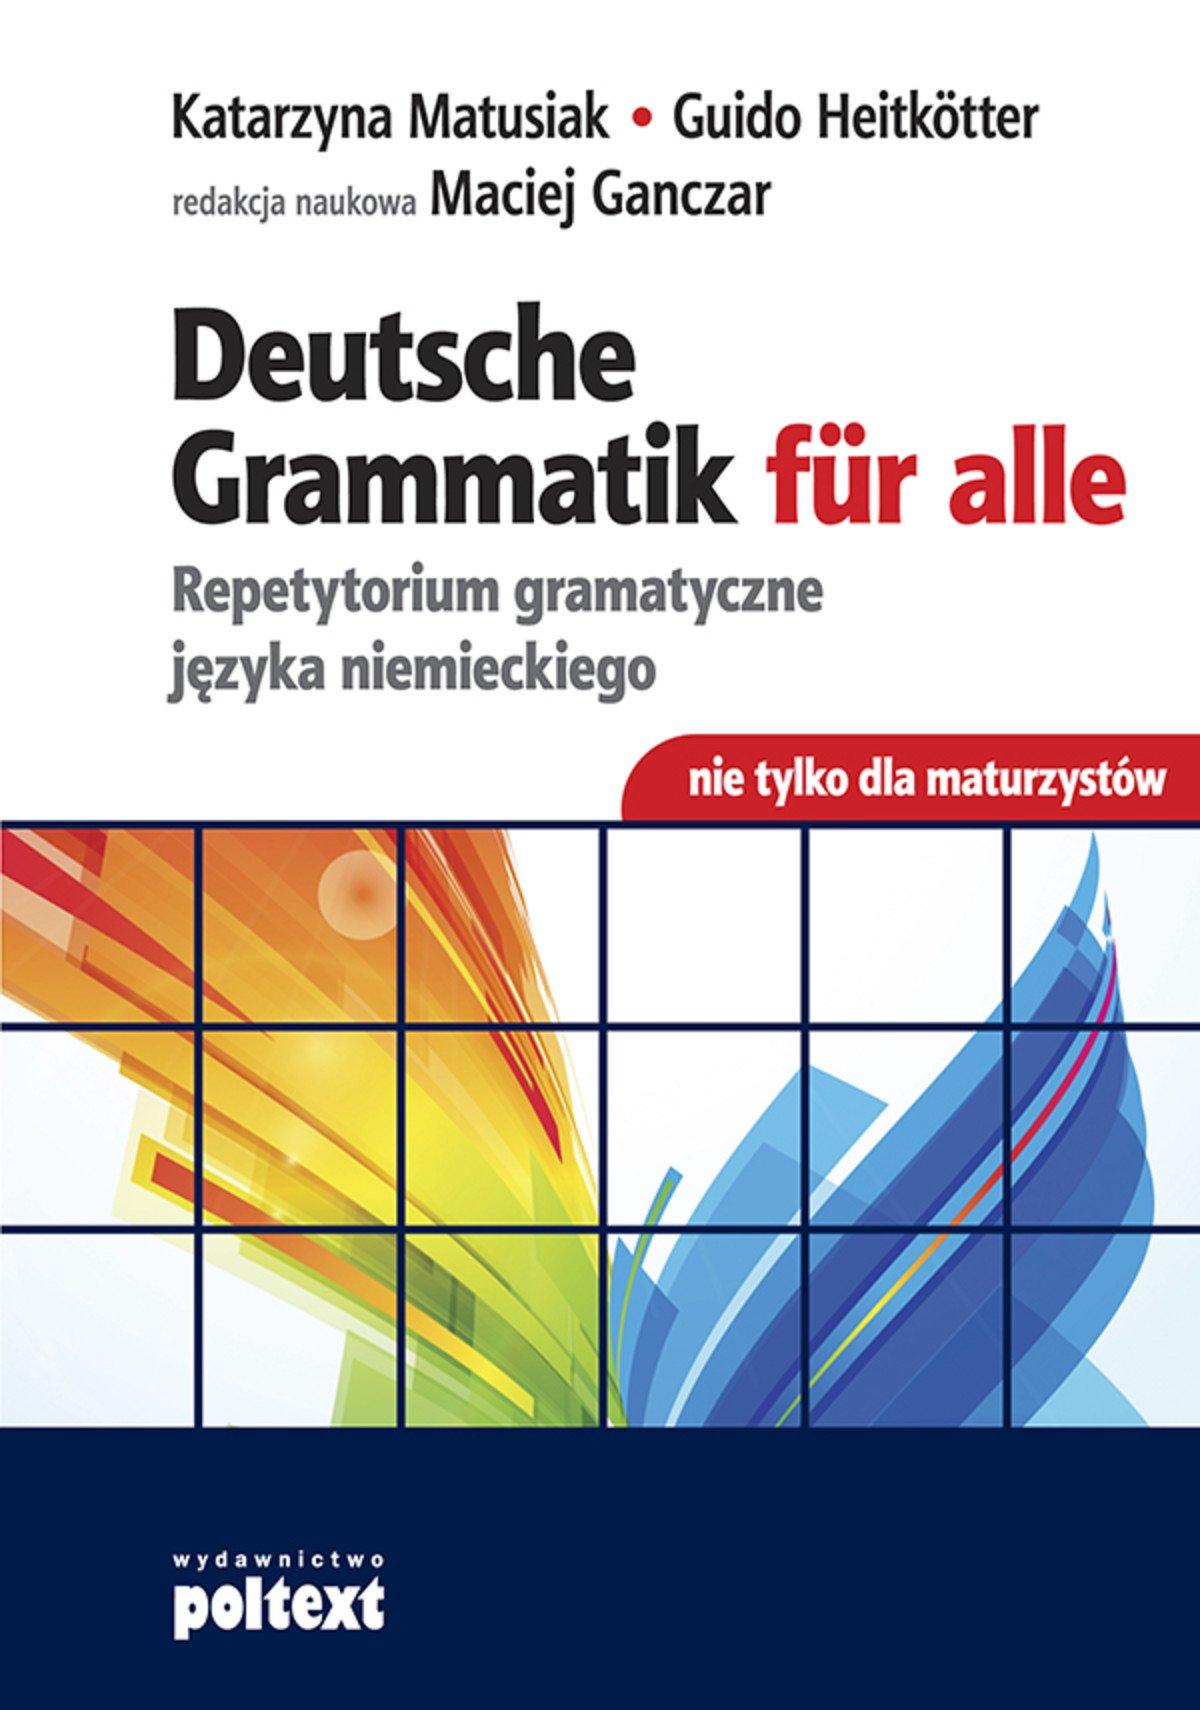 Deutsche Grammatik für alle - Ebook (Książka na Kindle) do pobrania w formacie MOBI